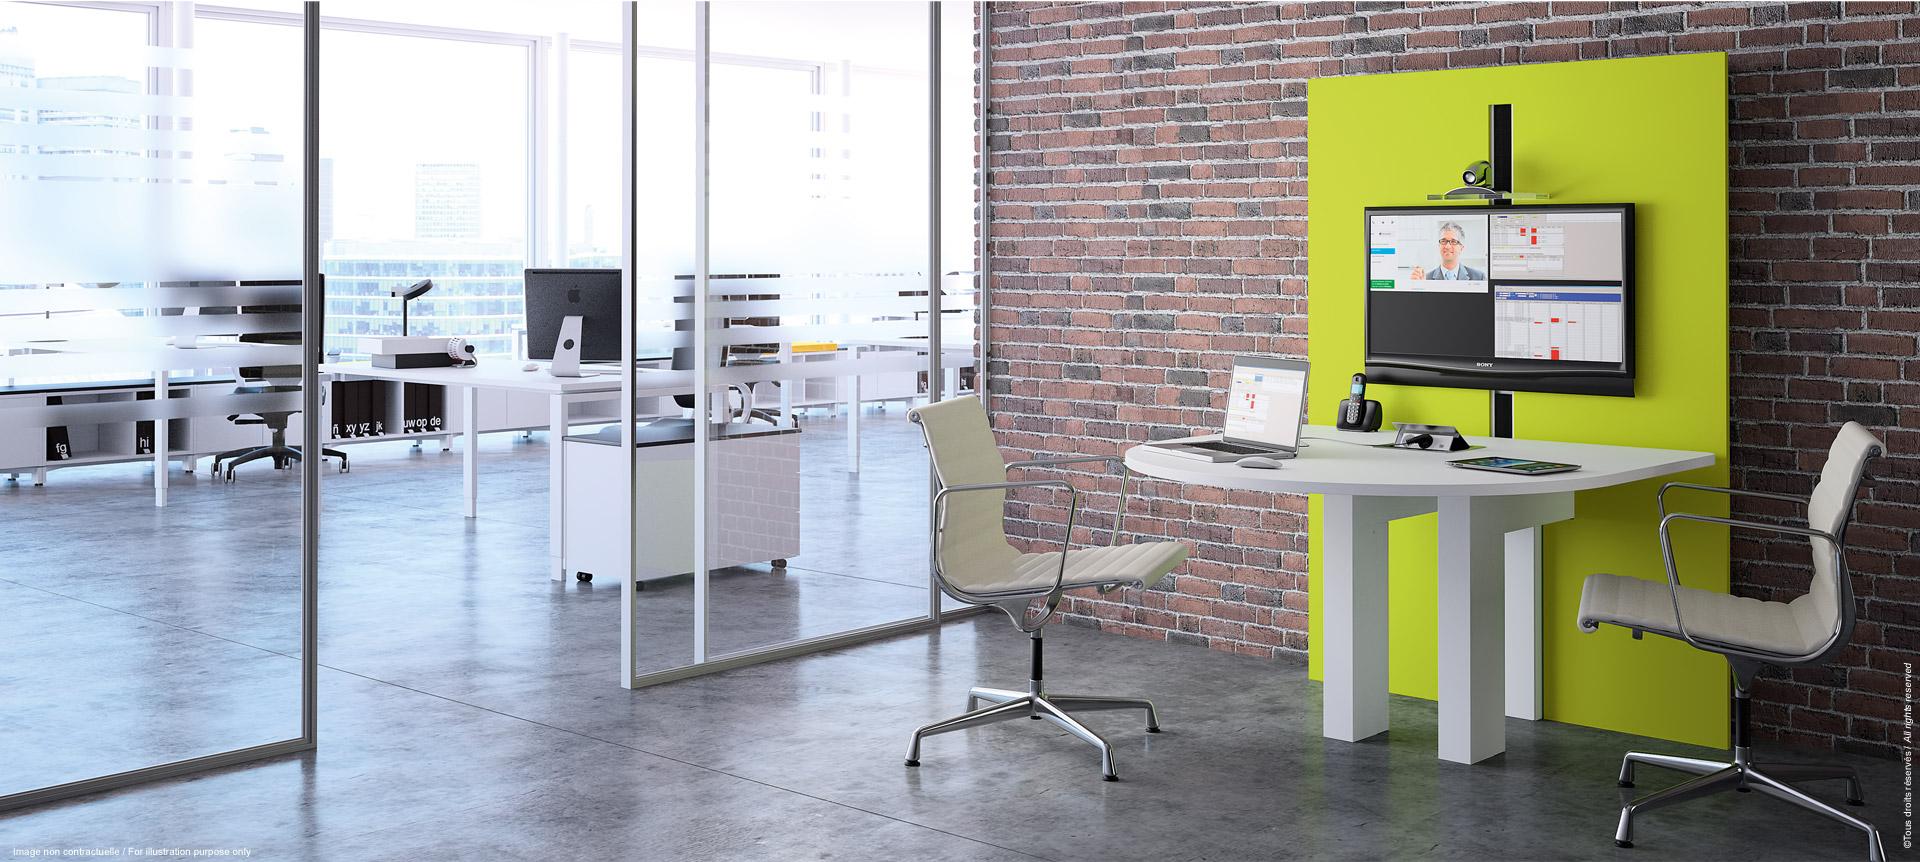 I-SHARE - meuble de réunion multimédia ajustable en hauteur